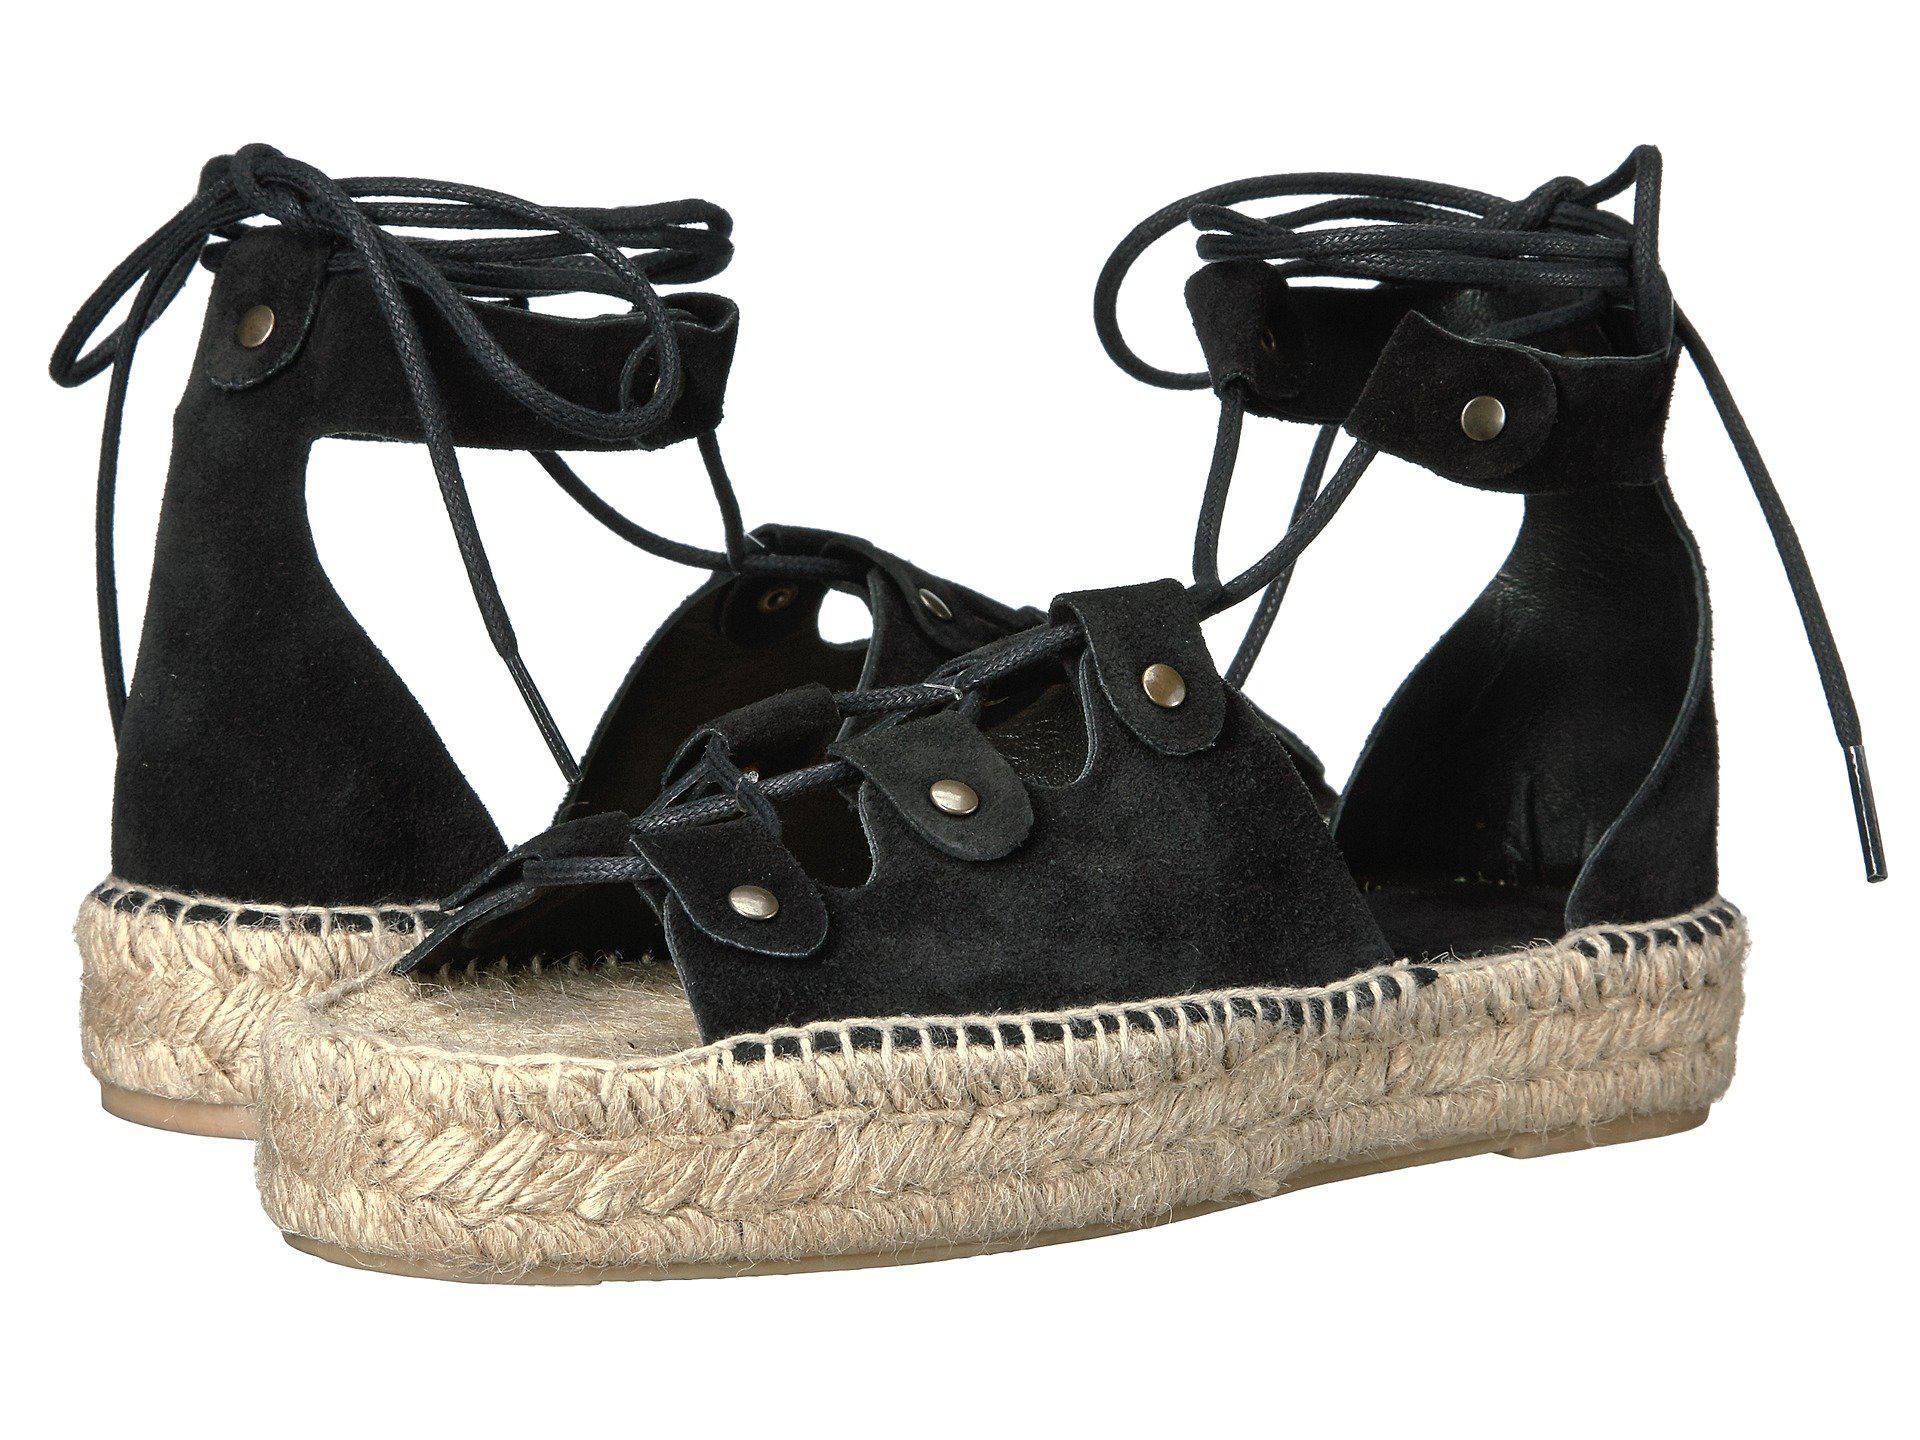 d4417173b22 Lyst - Soludos Ghillie Lace-up Suede Platform Sandal in Black